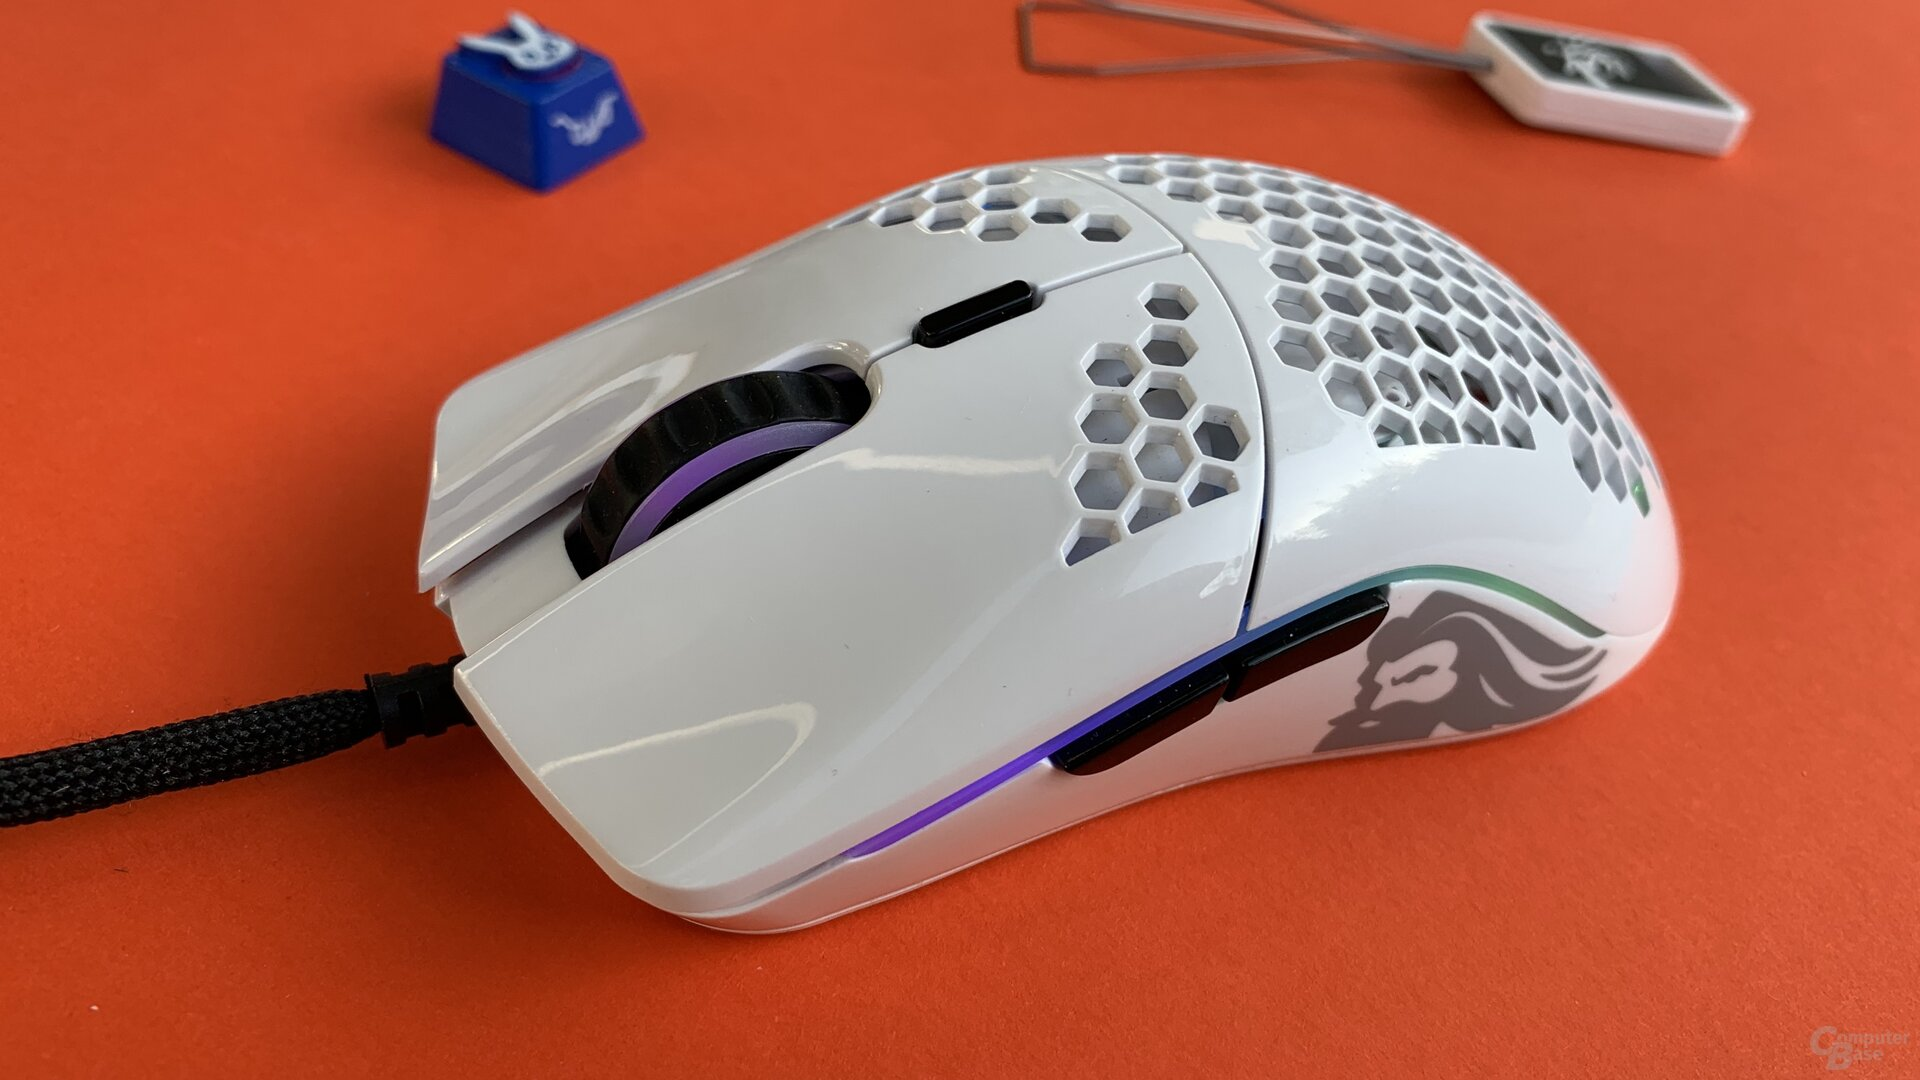 Glorious PC Gaming Race Model O-